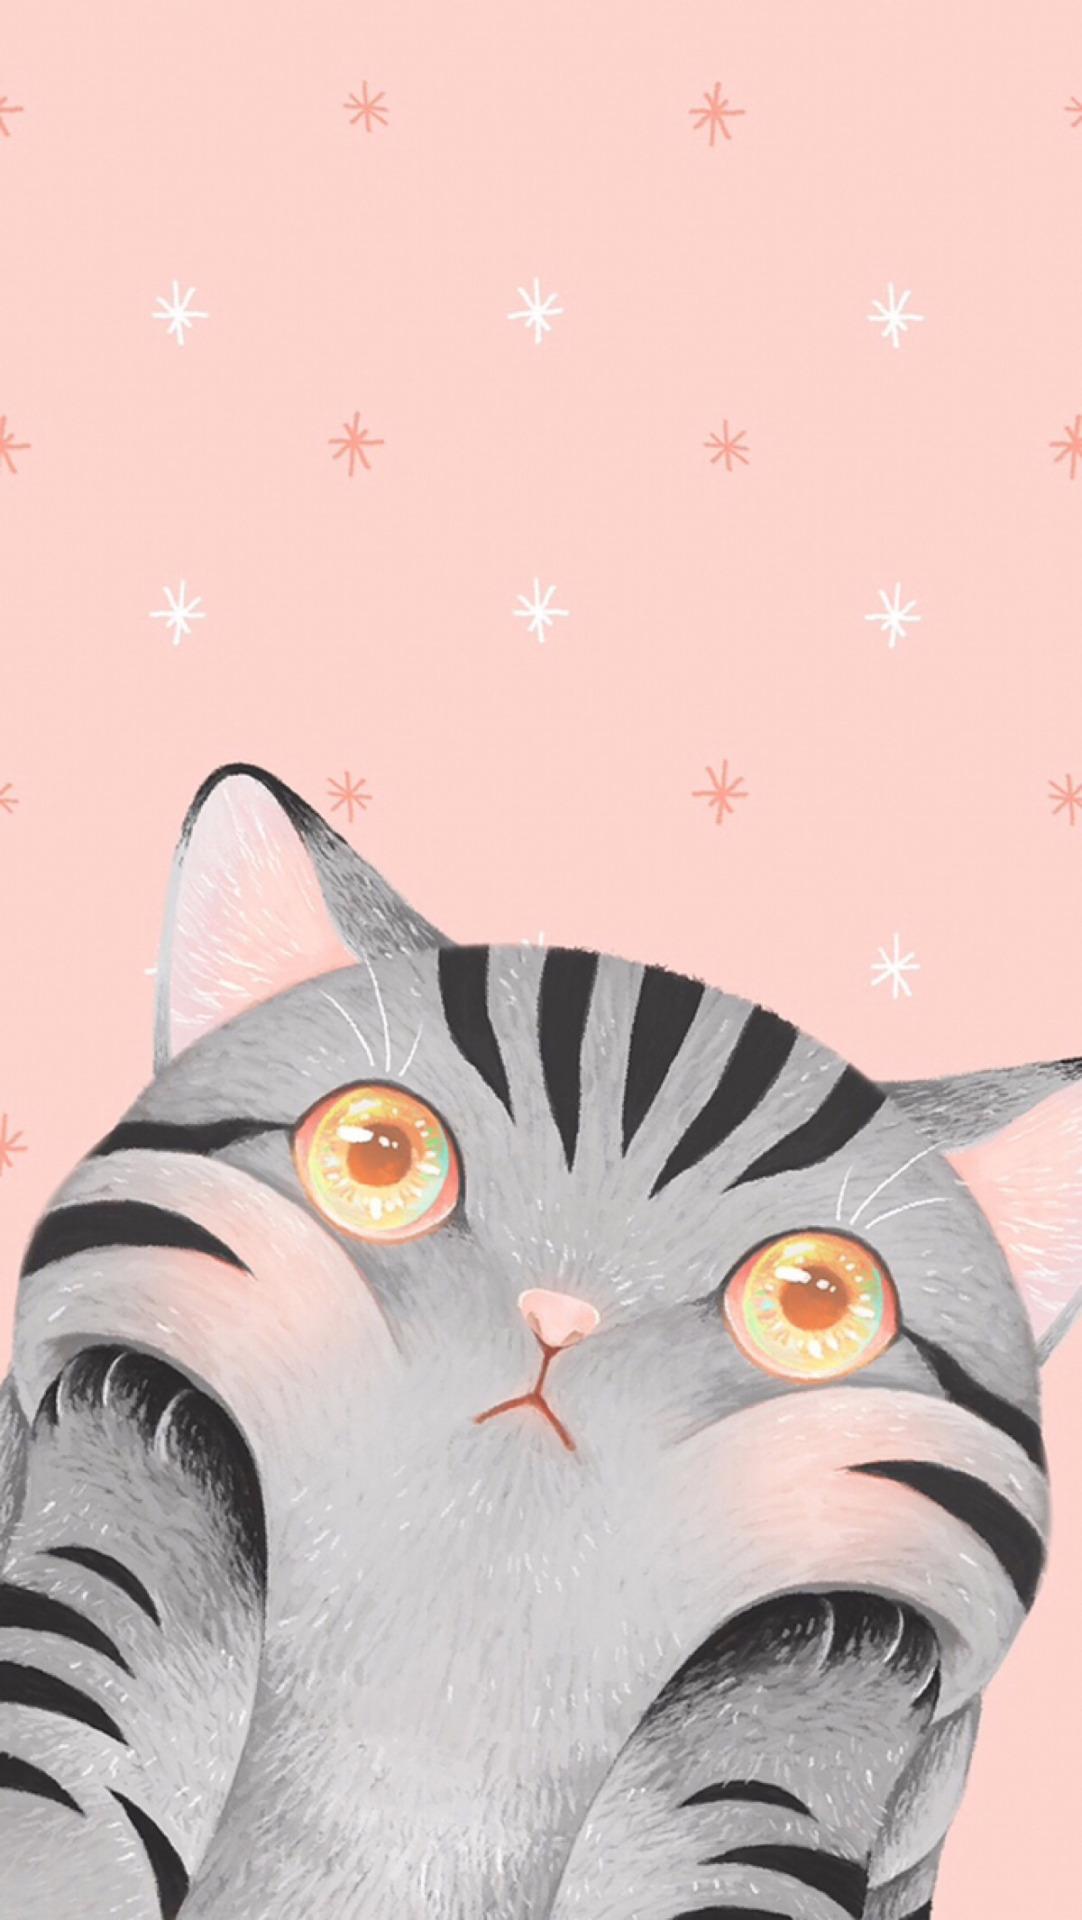 free cute phone wallpapers backgrounds pixelstalk net